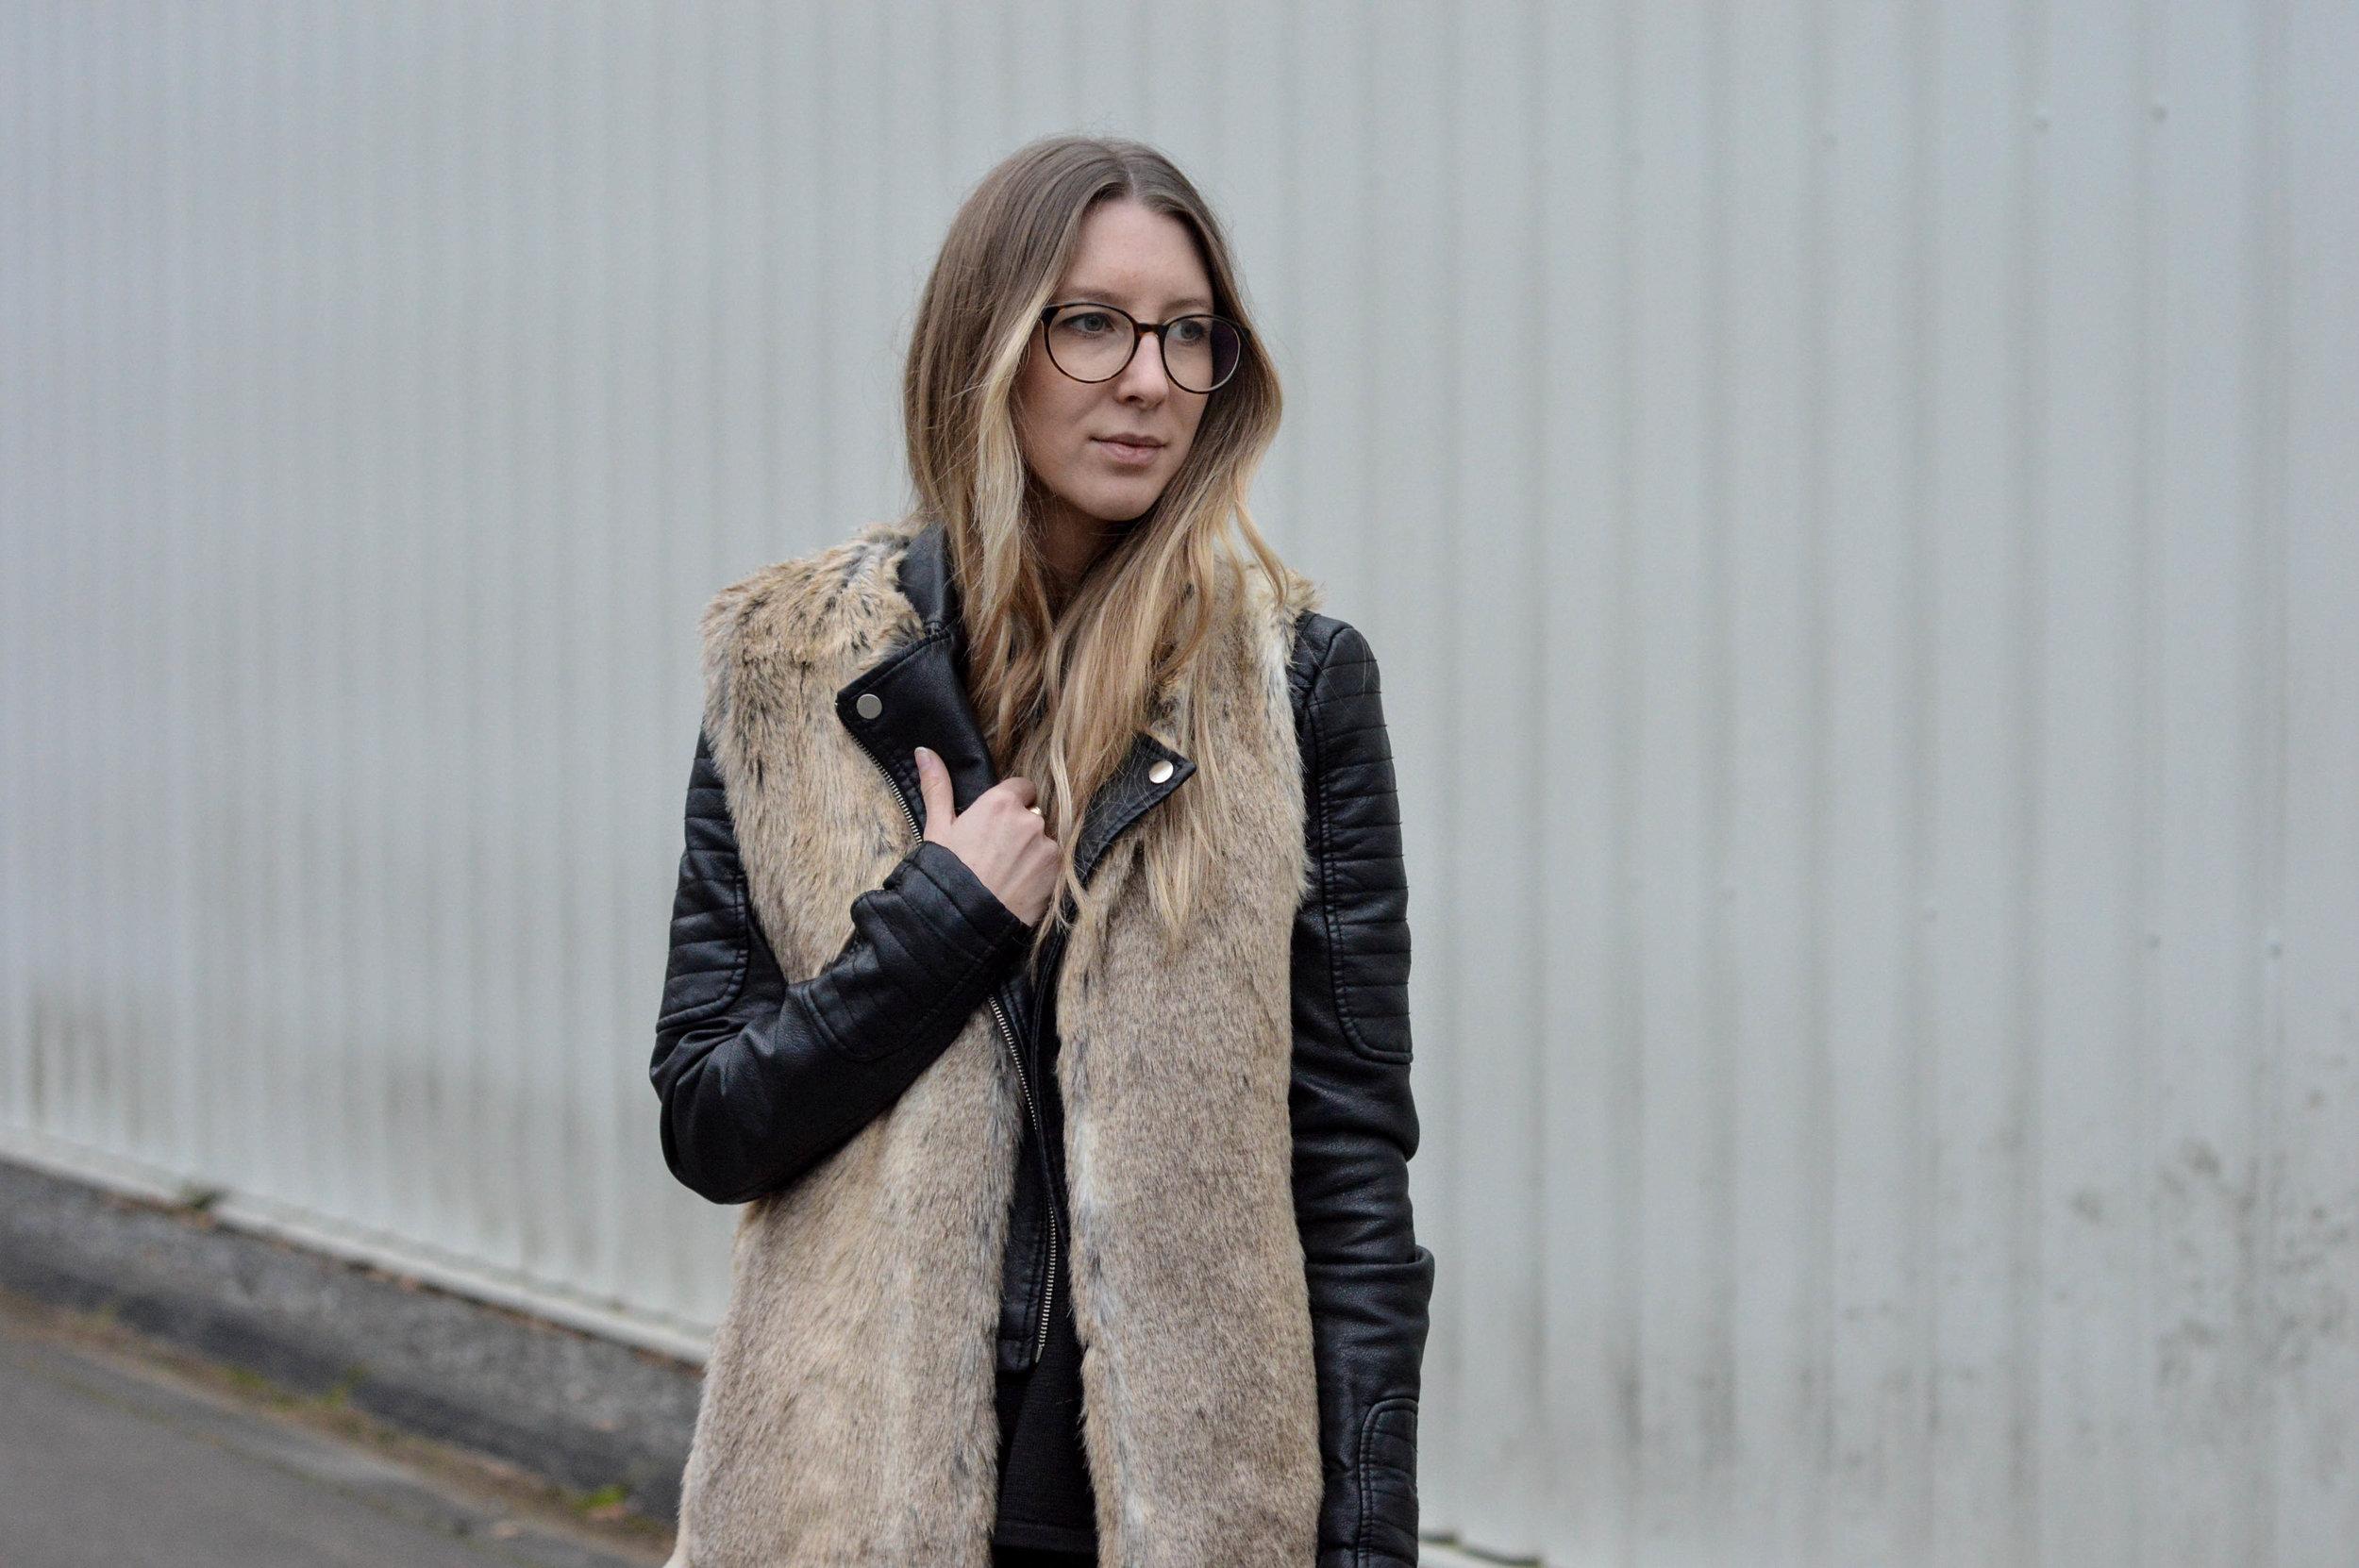 Faux Fur Jacket - OSIARAH.COM (7 of 17).jpg